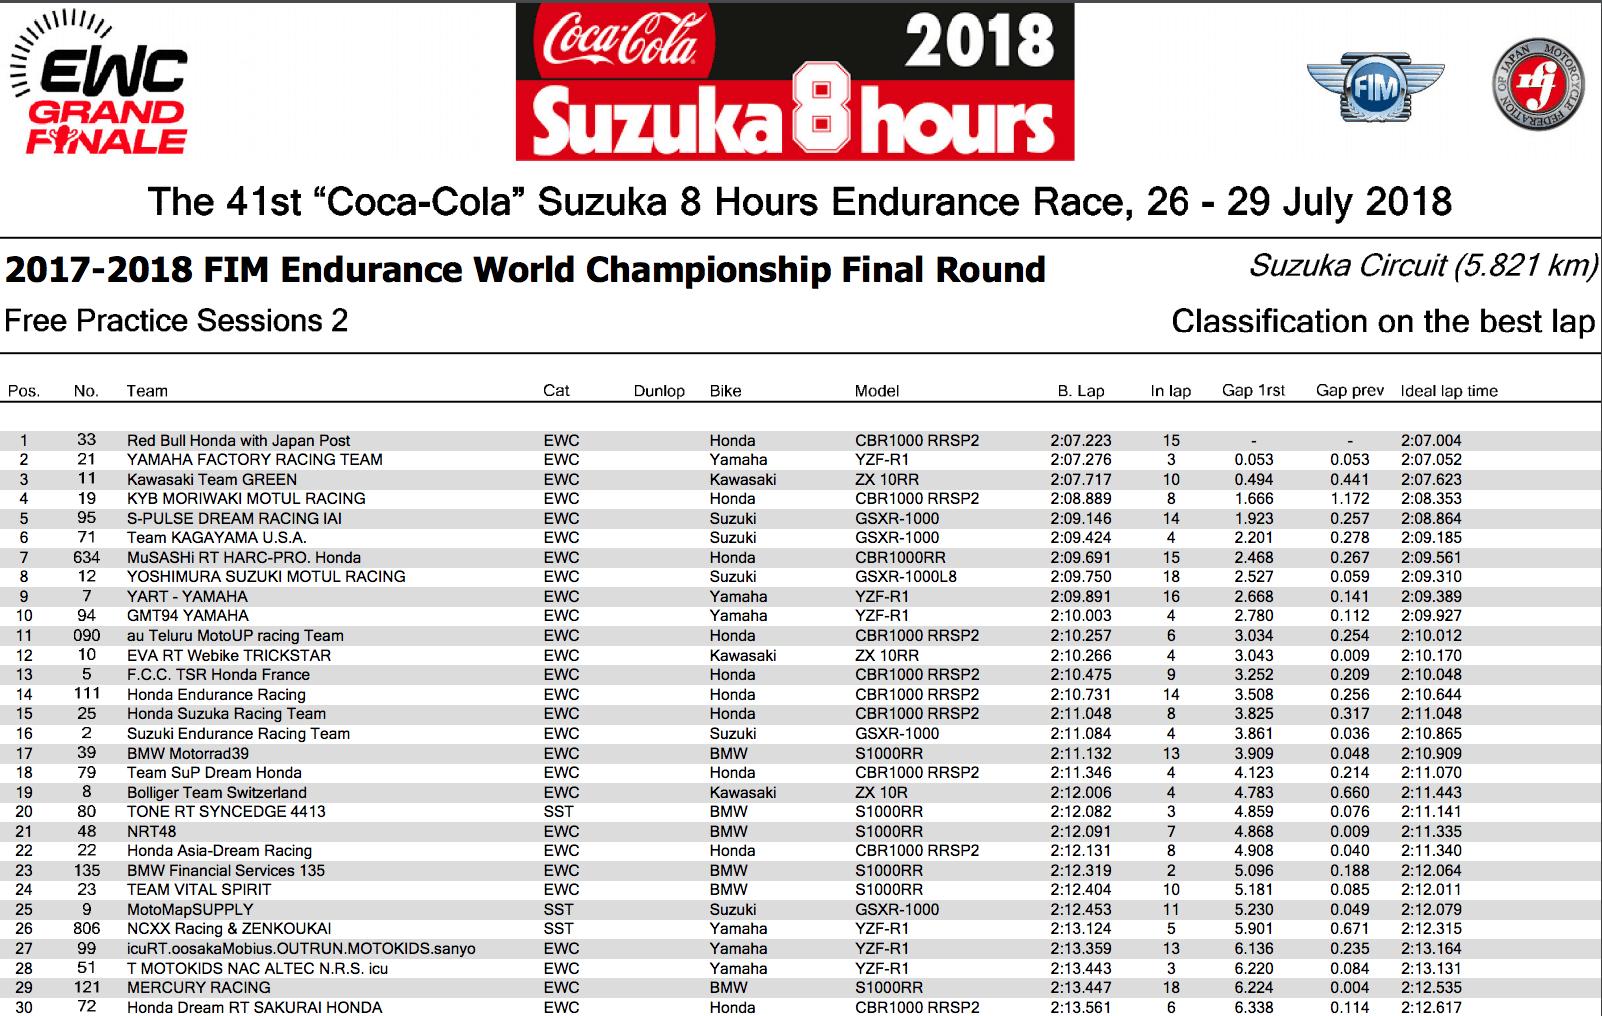 ★FIM世界耐久選手権シリーズ 鈴鹿8時間耐久 フリー走行2回目結果